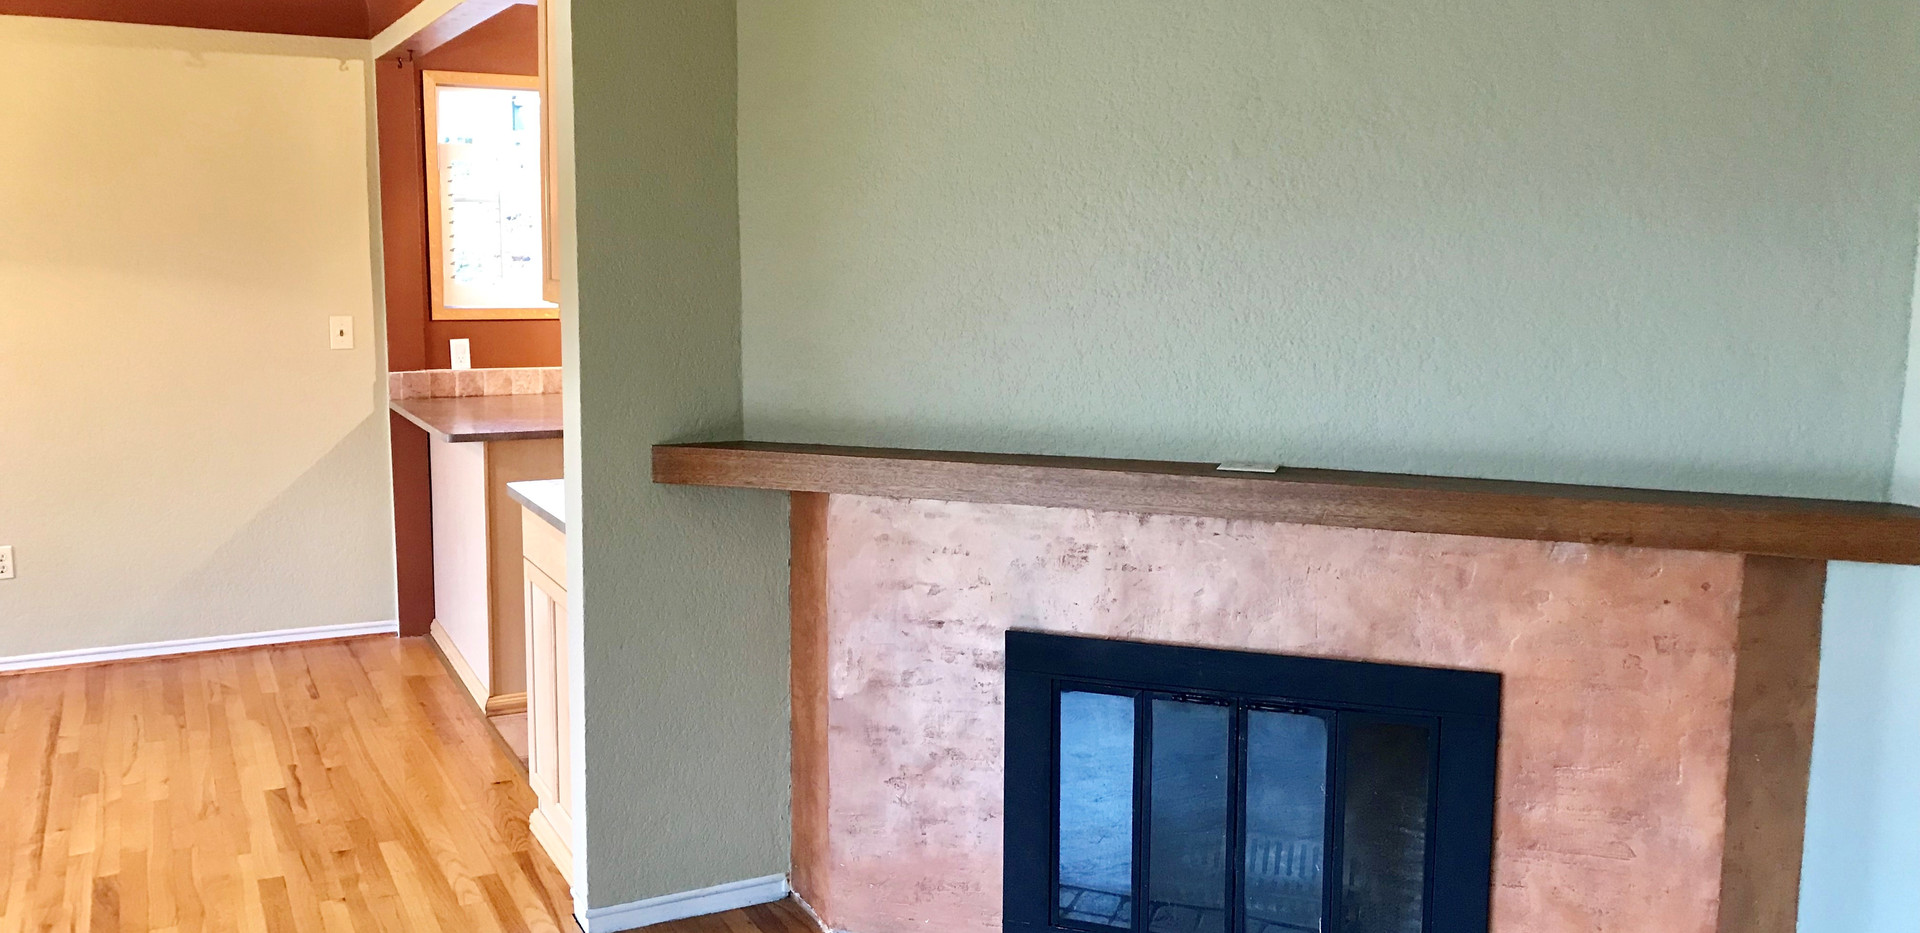 Fireplace - no furniture1.jpg